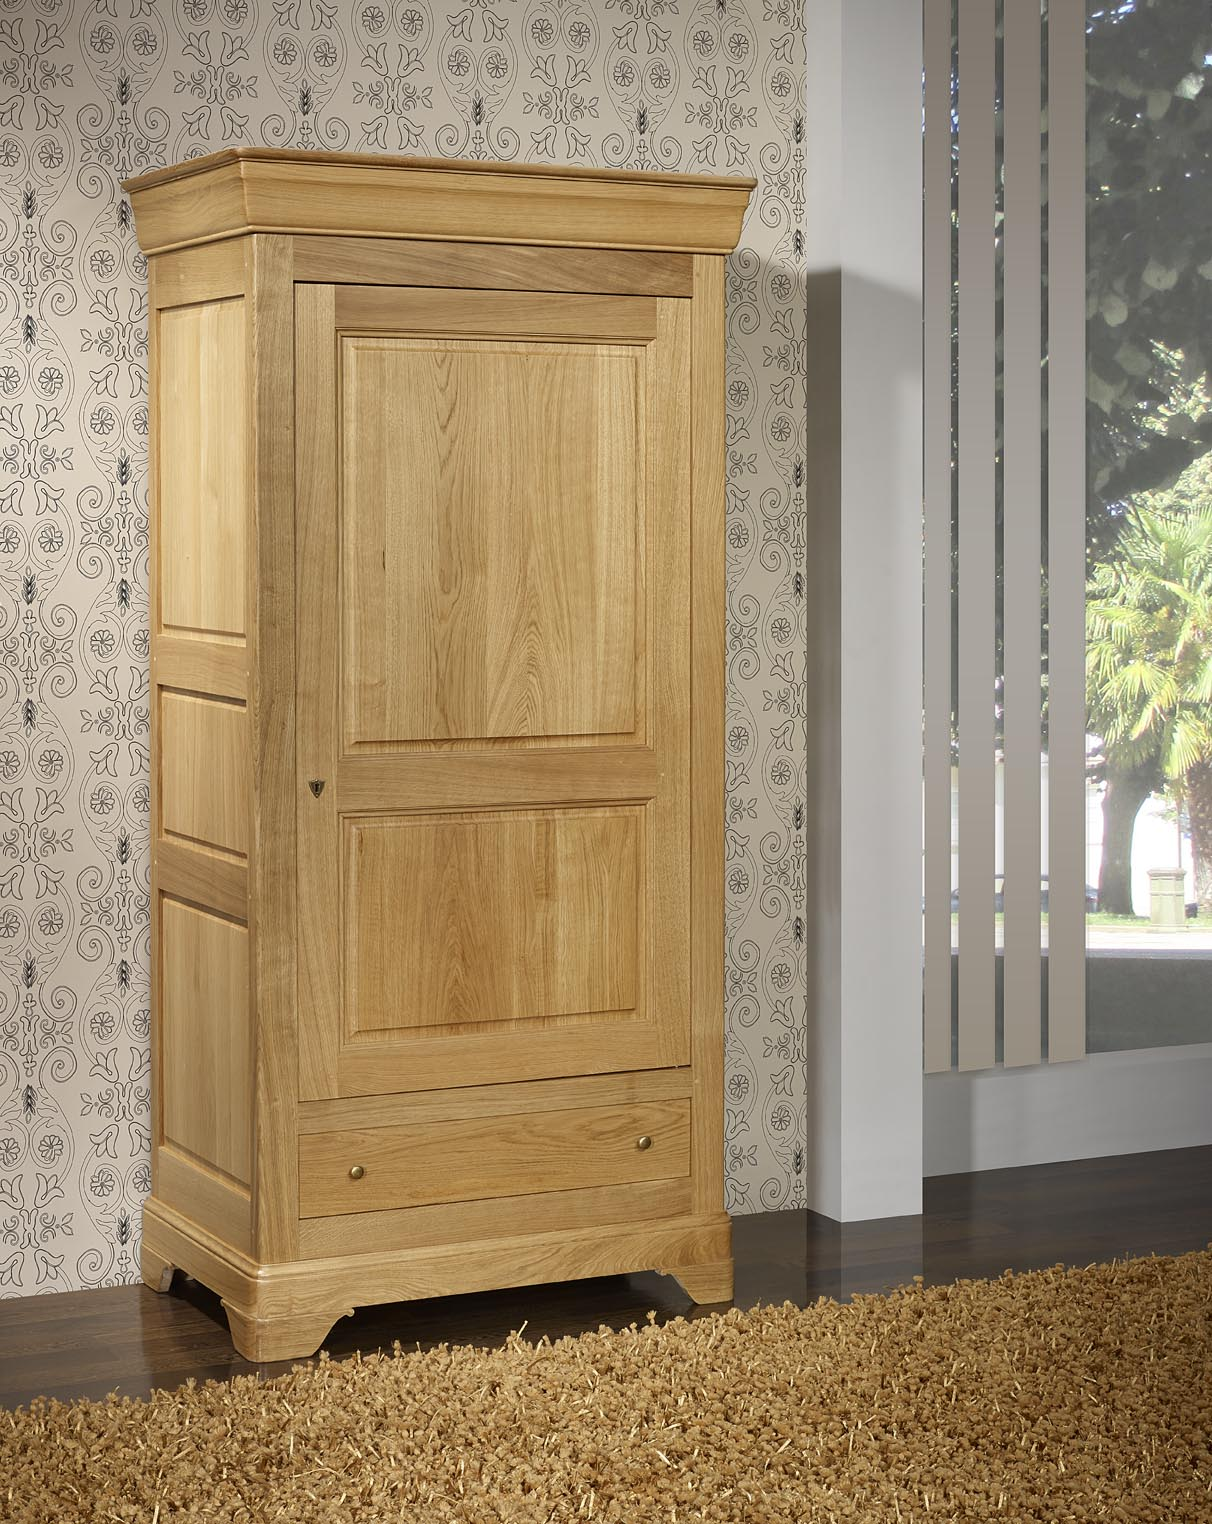 bonnetiere chene. Black Bedroom Furniture Sets. Home Design Ideas